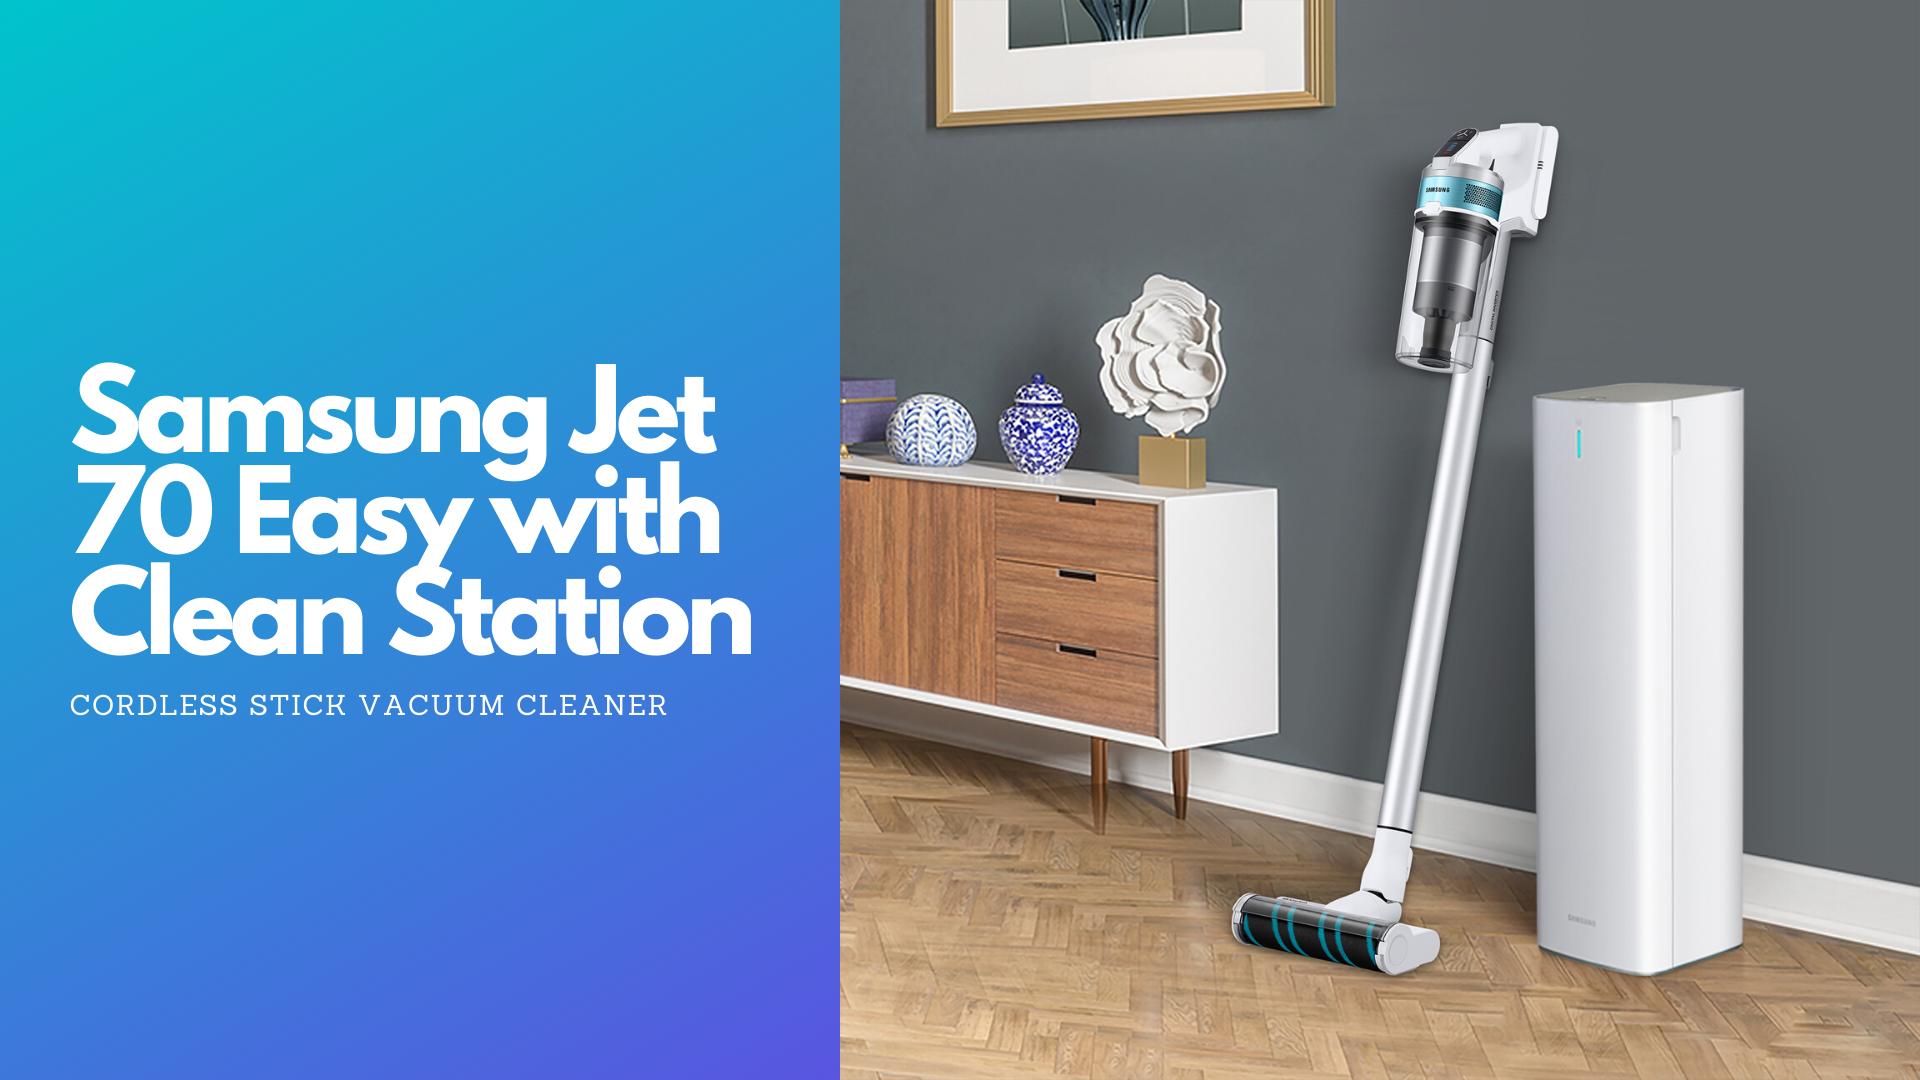 Samsung Jet 70 Easy